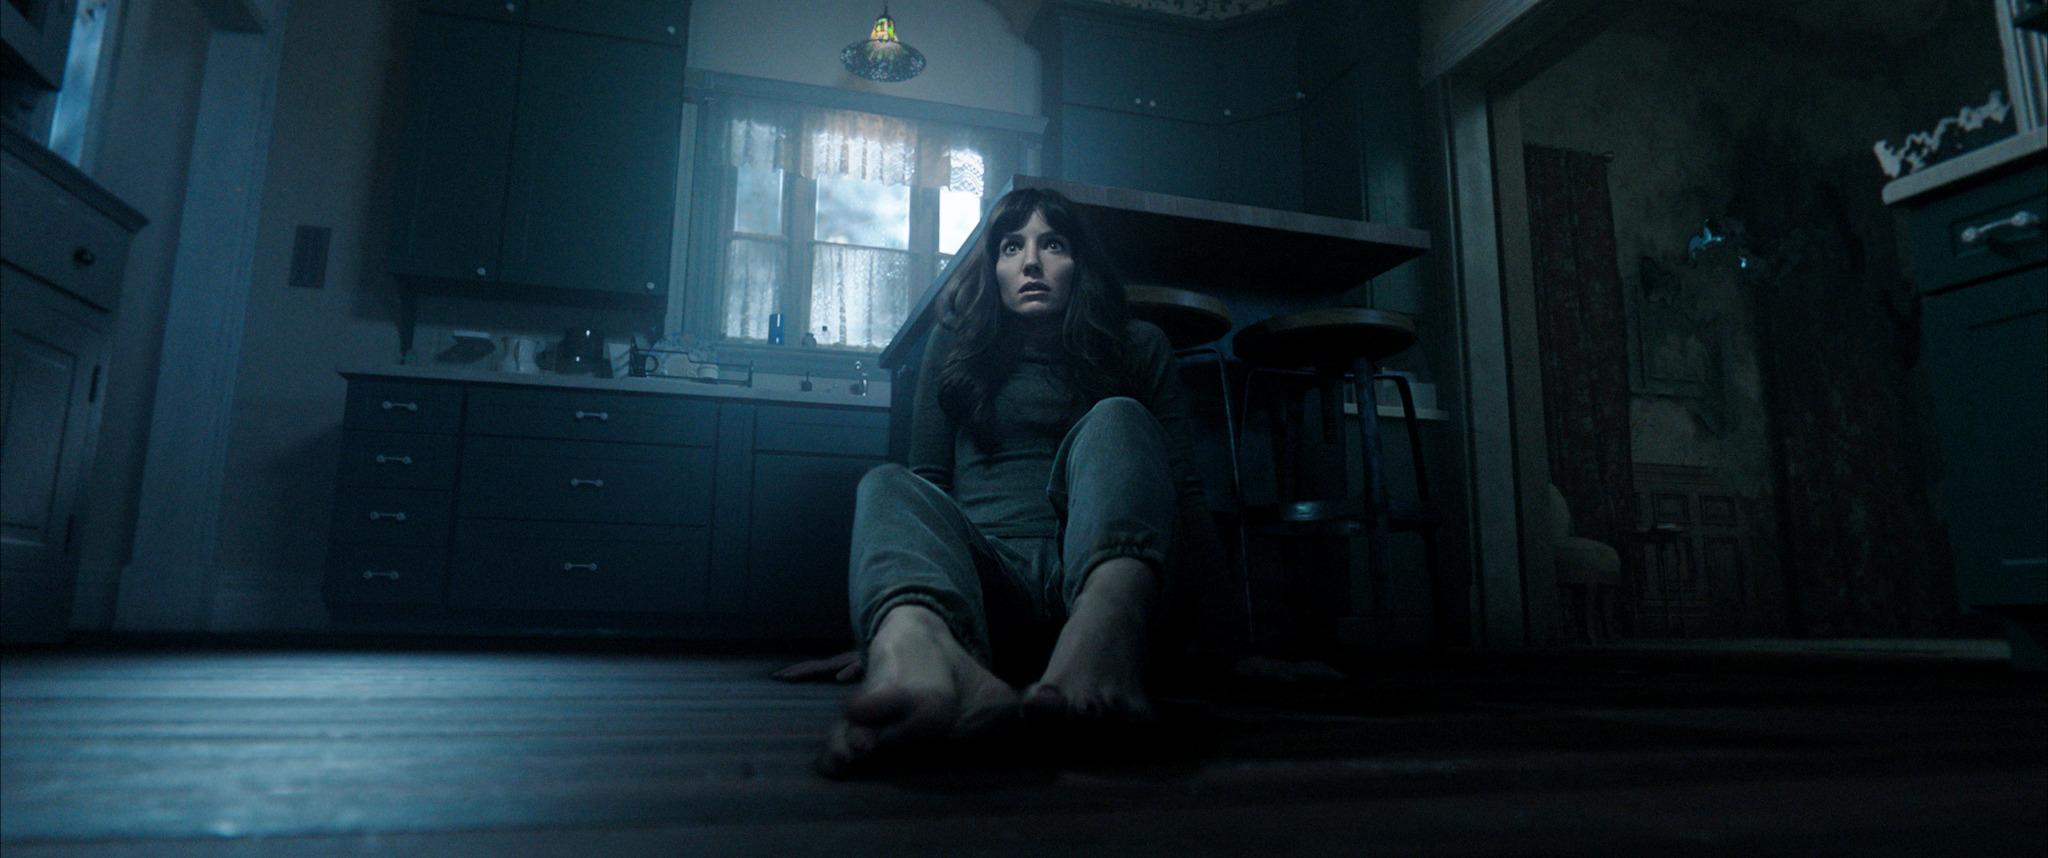 ANNABELLE WALLIS as Madison im Horror Thriller Malignant